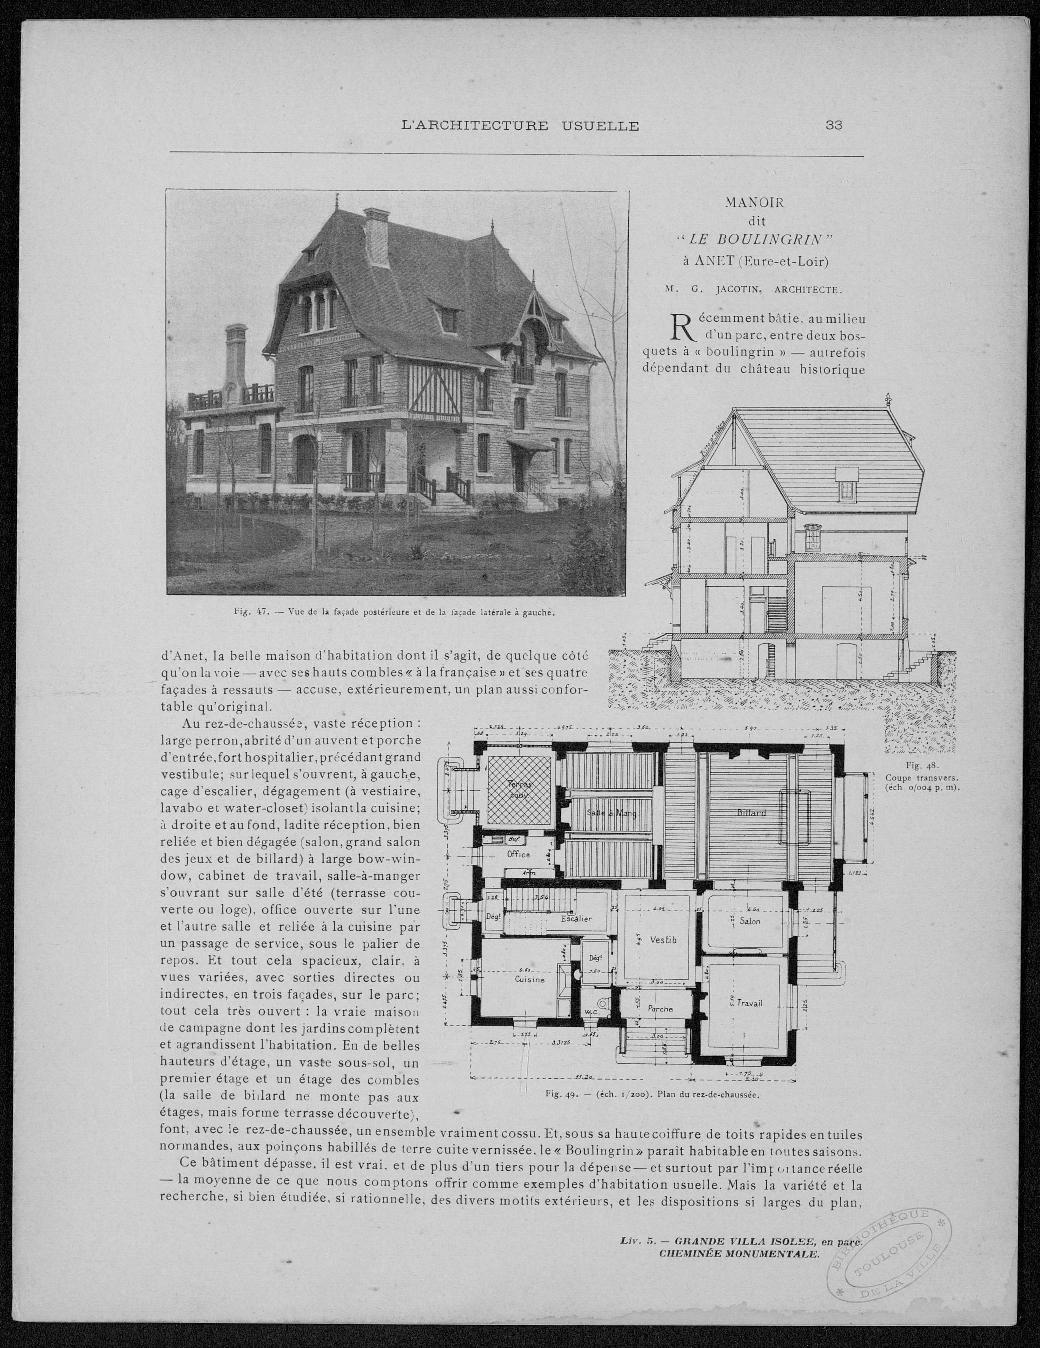 Architecture Usuelle |